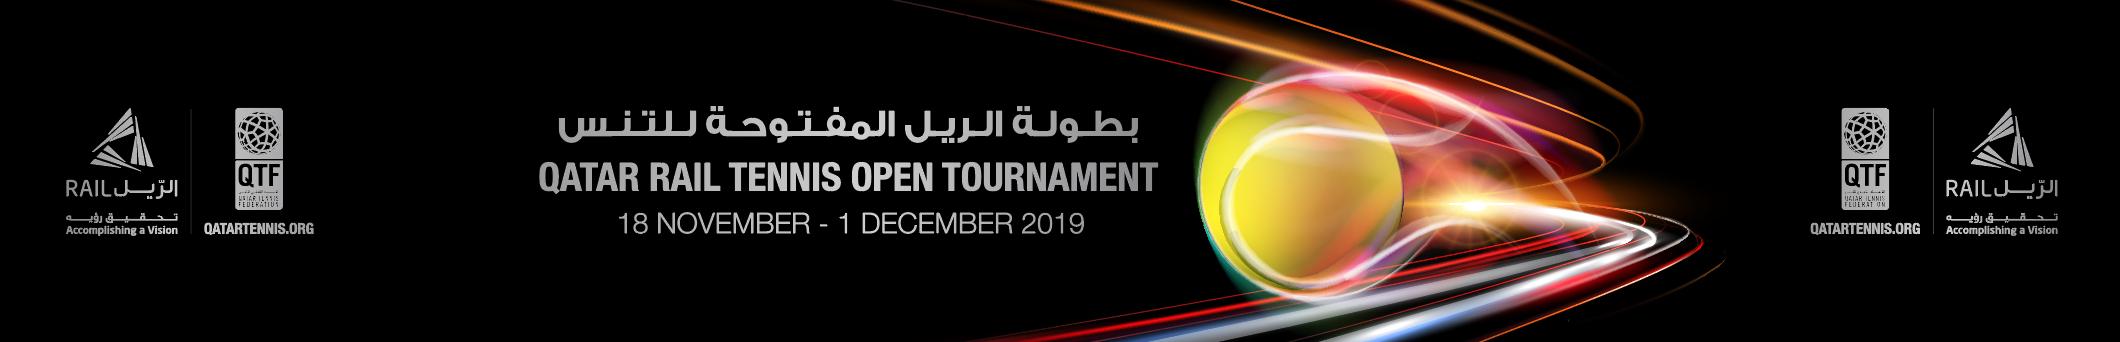 Qatar Rail Tennis Open Tournament